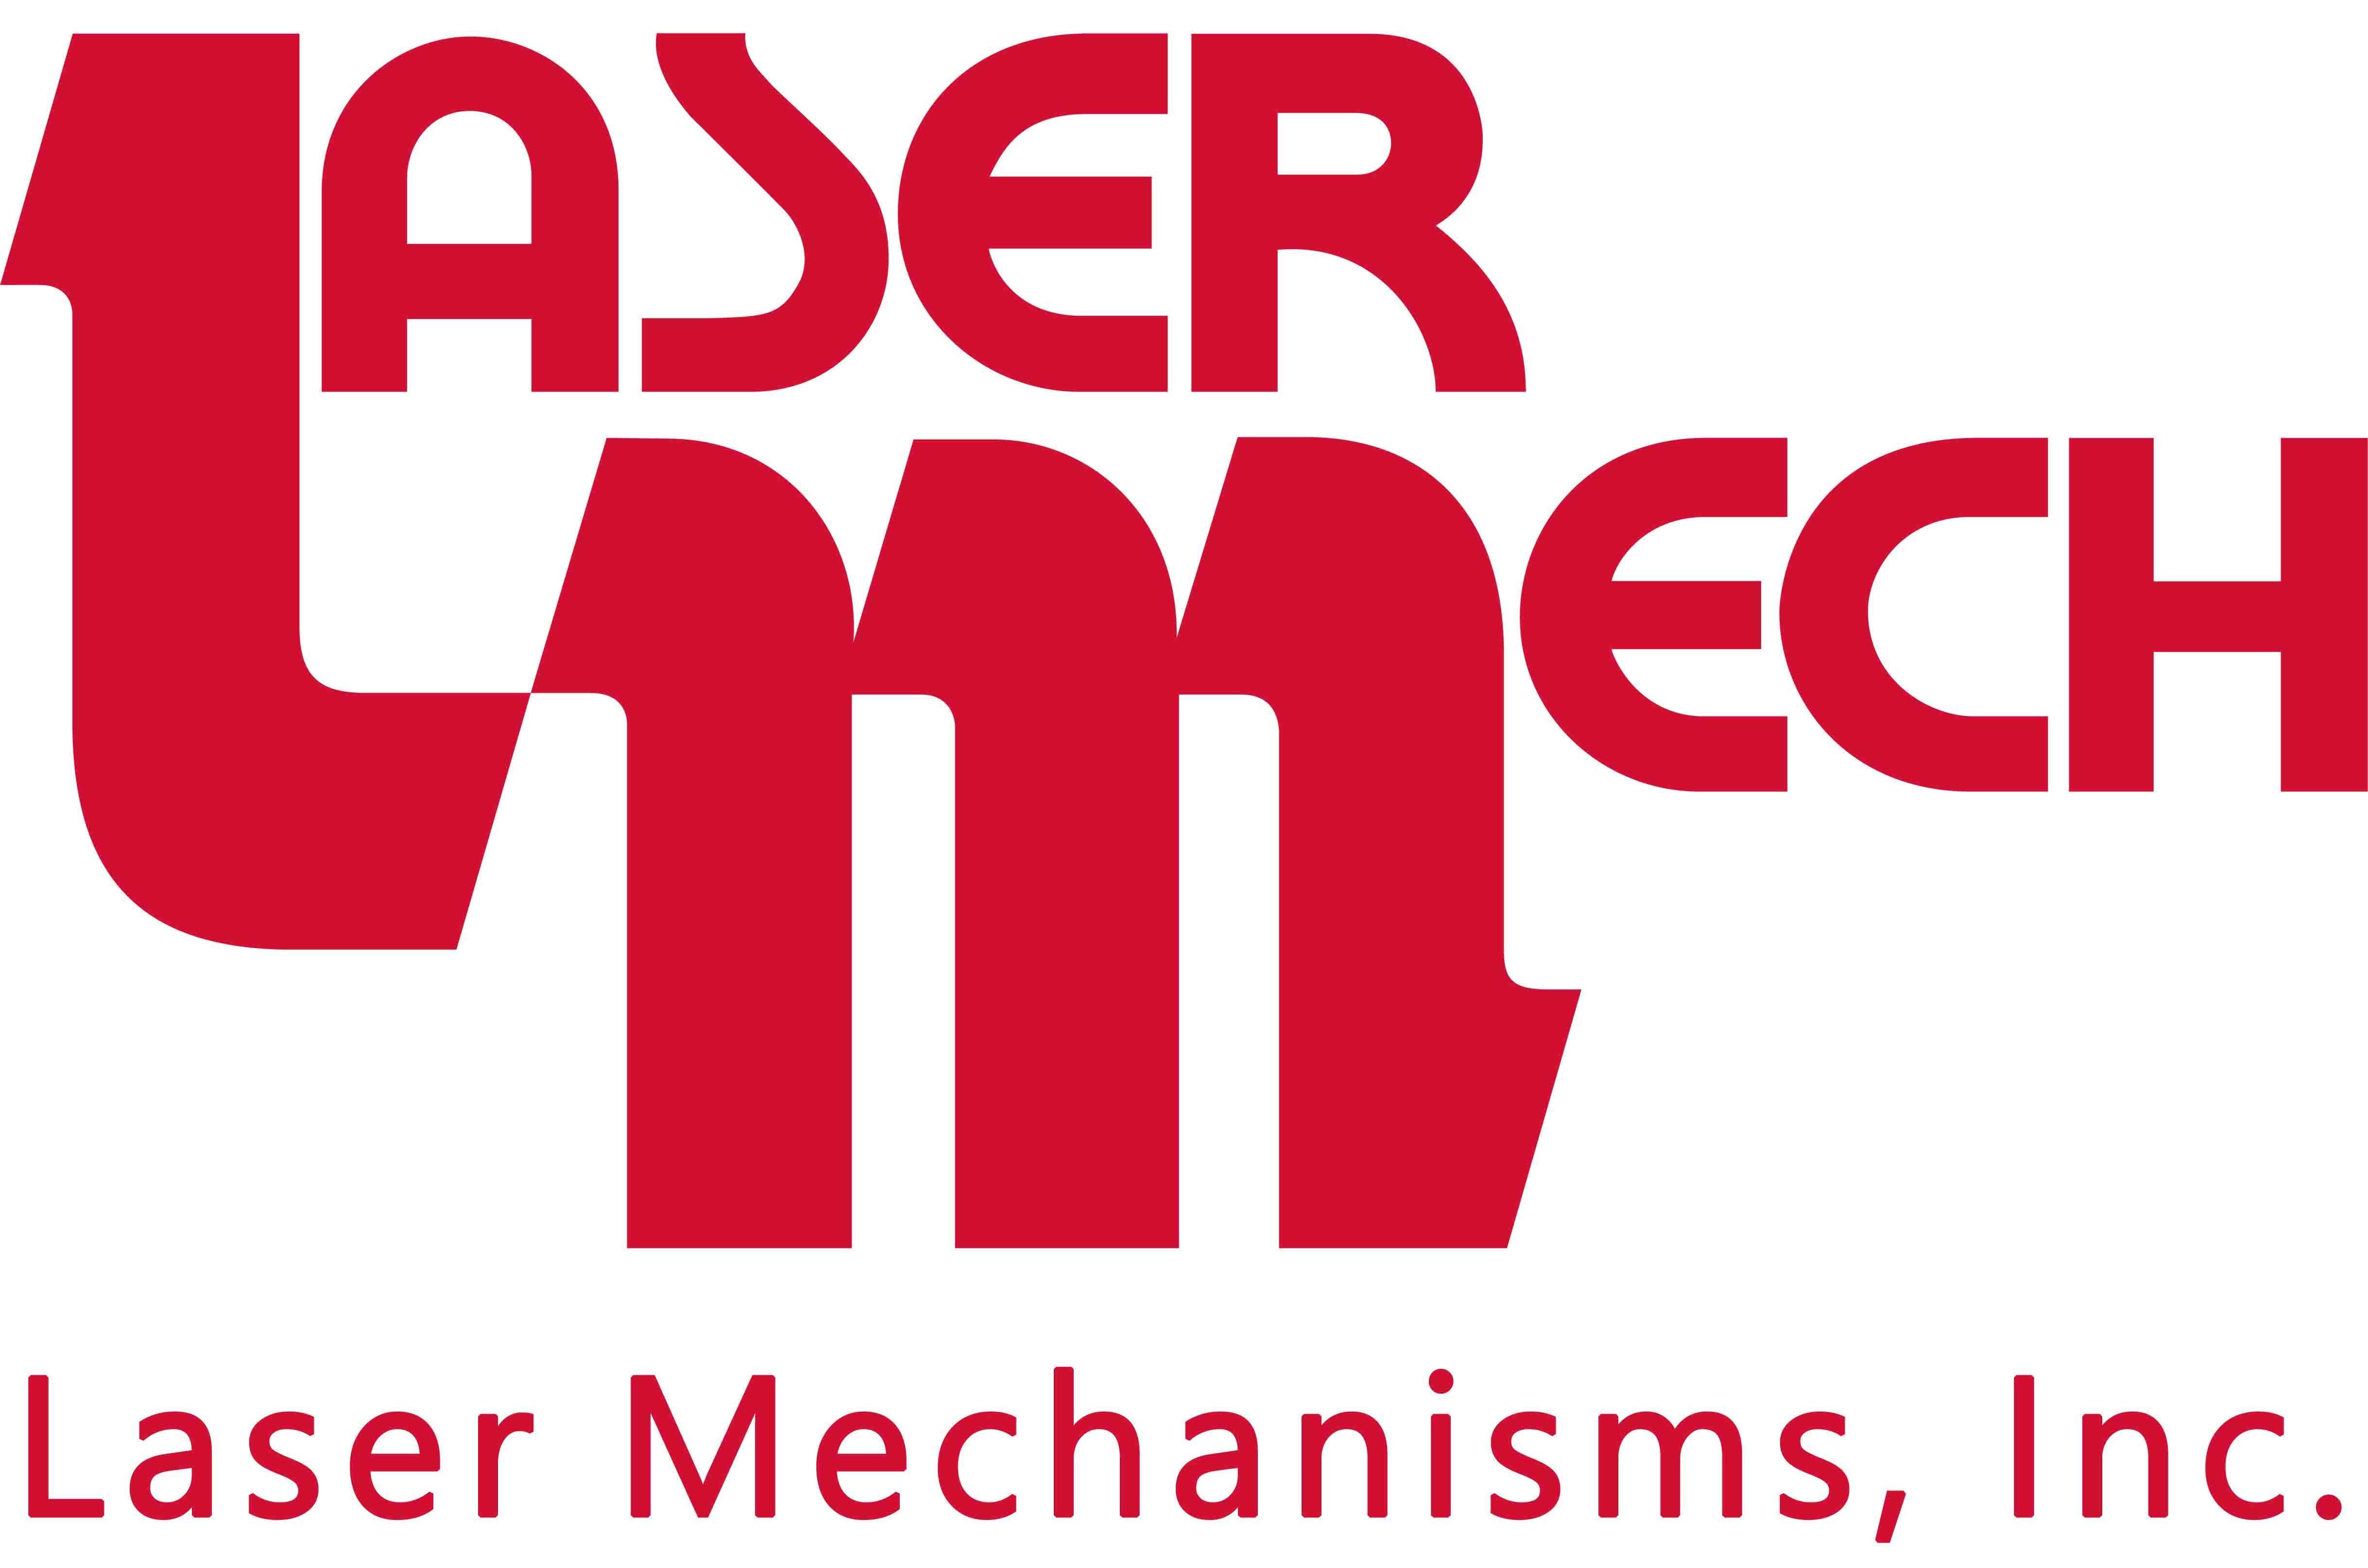 LaserMechanisms, Inc.